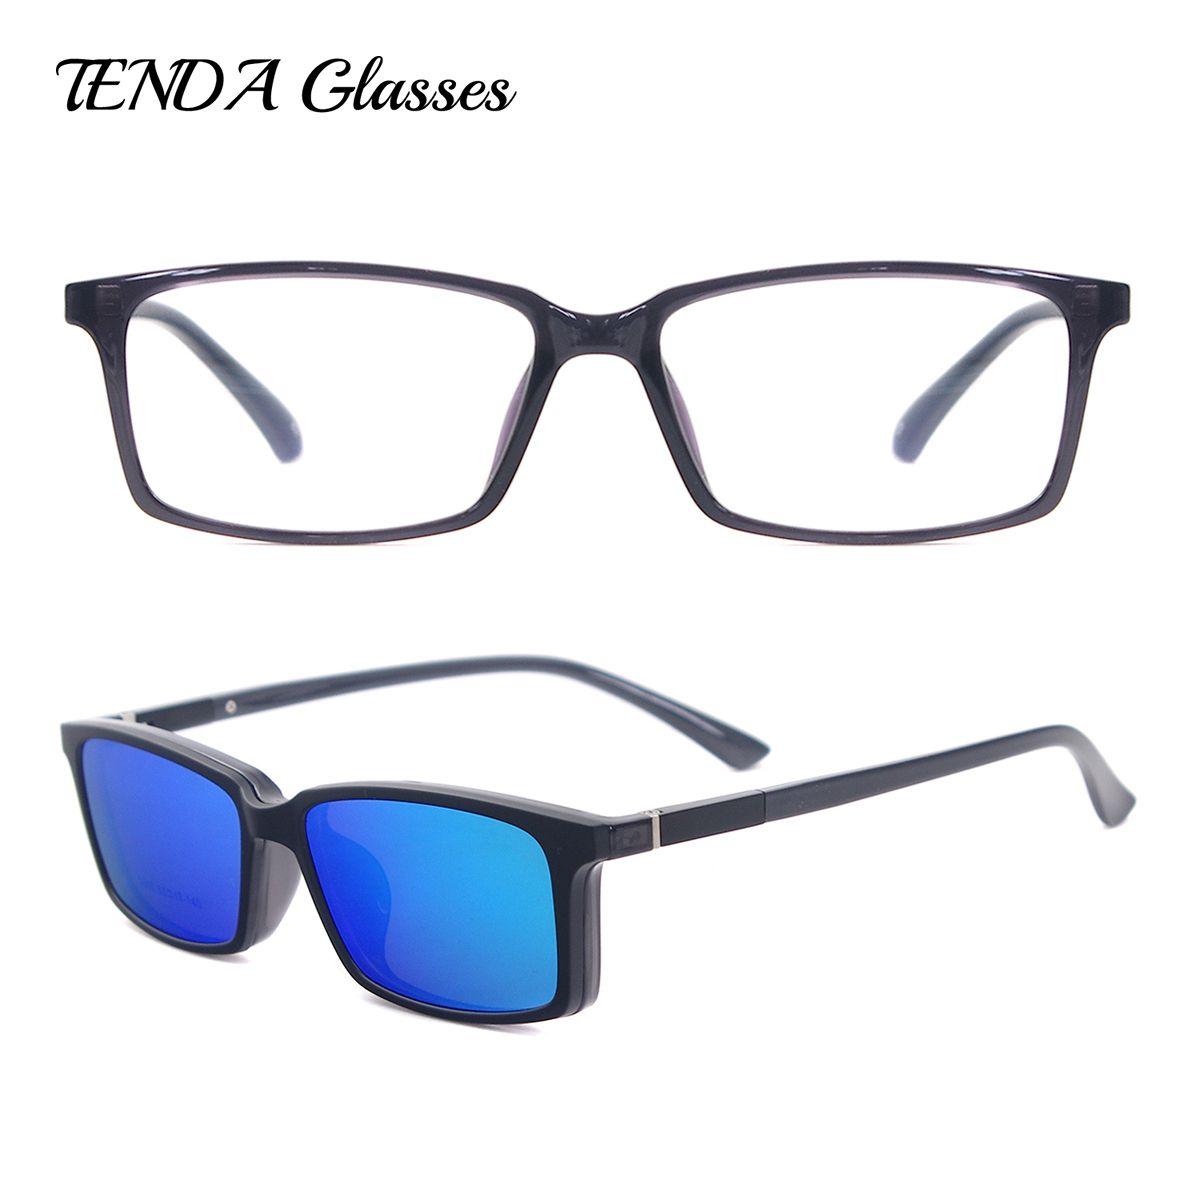 afbc00488 TendaGlasses Lightweight Flexible Rectangular TR90 Men Women Prescription  Eyeglass Frame with Polarized Clip On Sunglasses Review